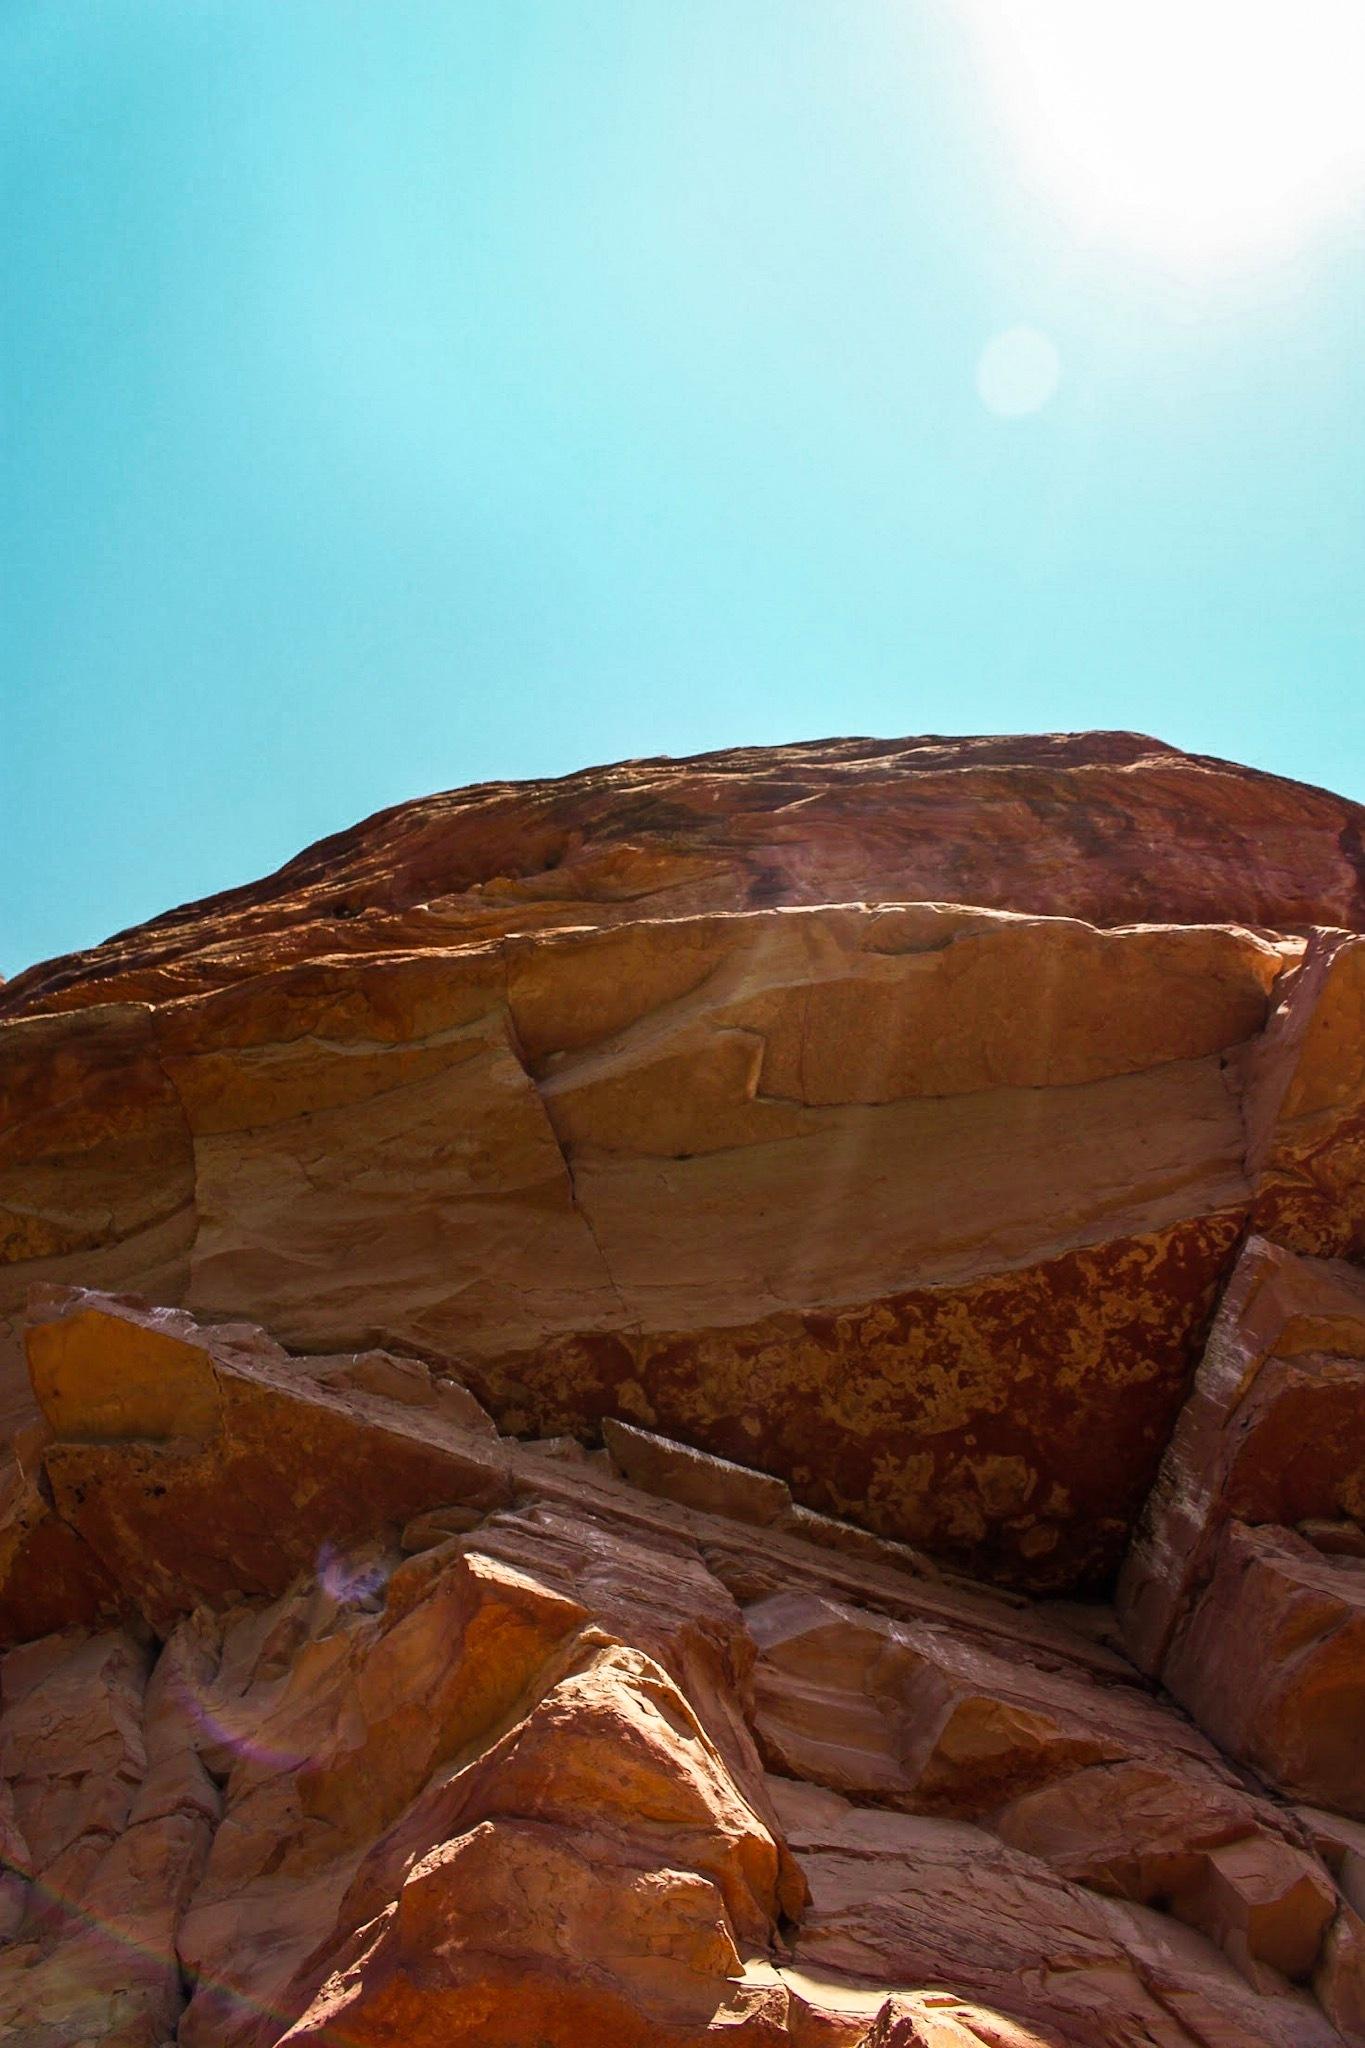 Sedona Rock by Jewelia Sims